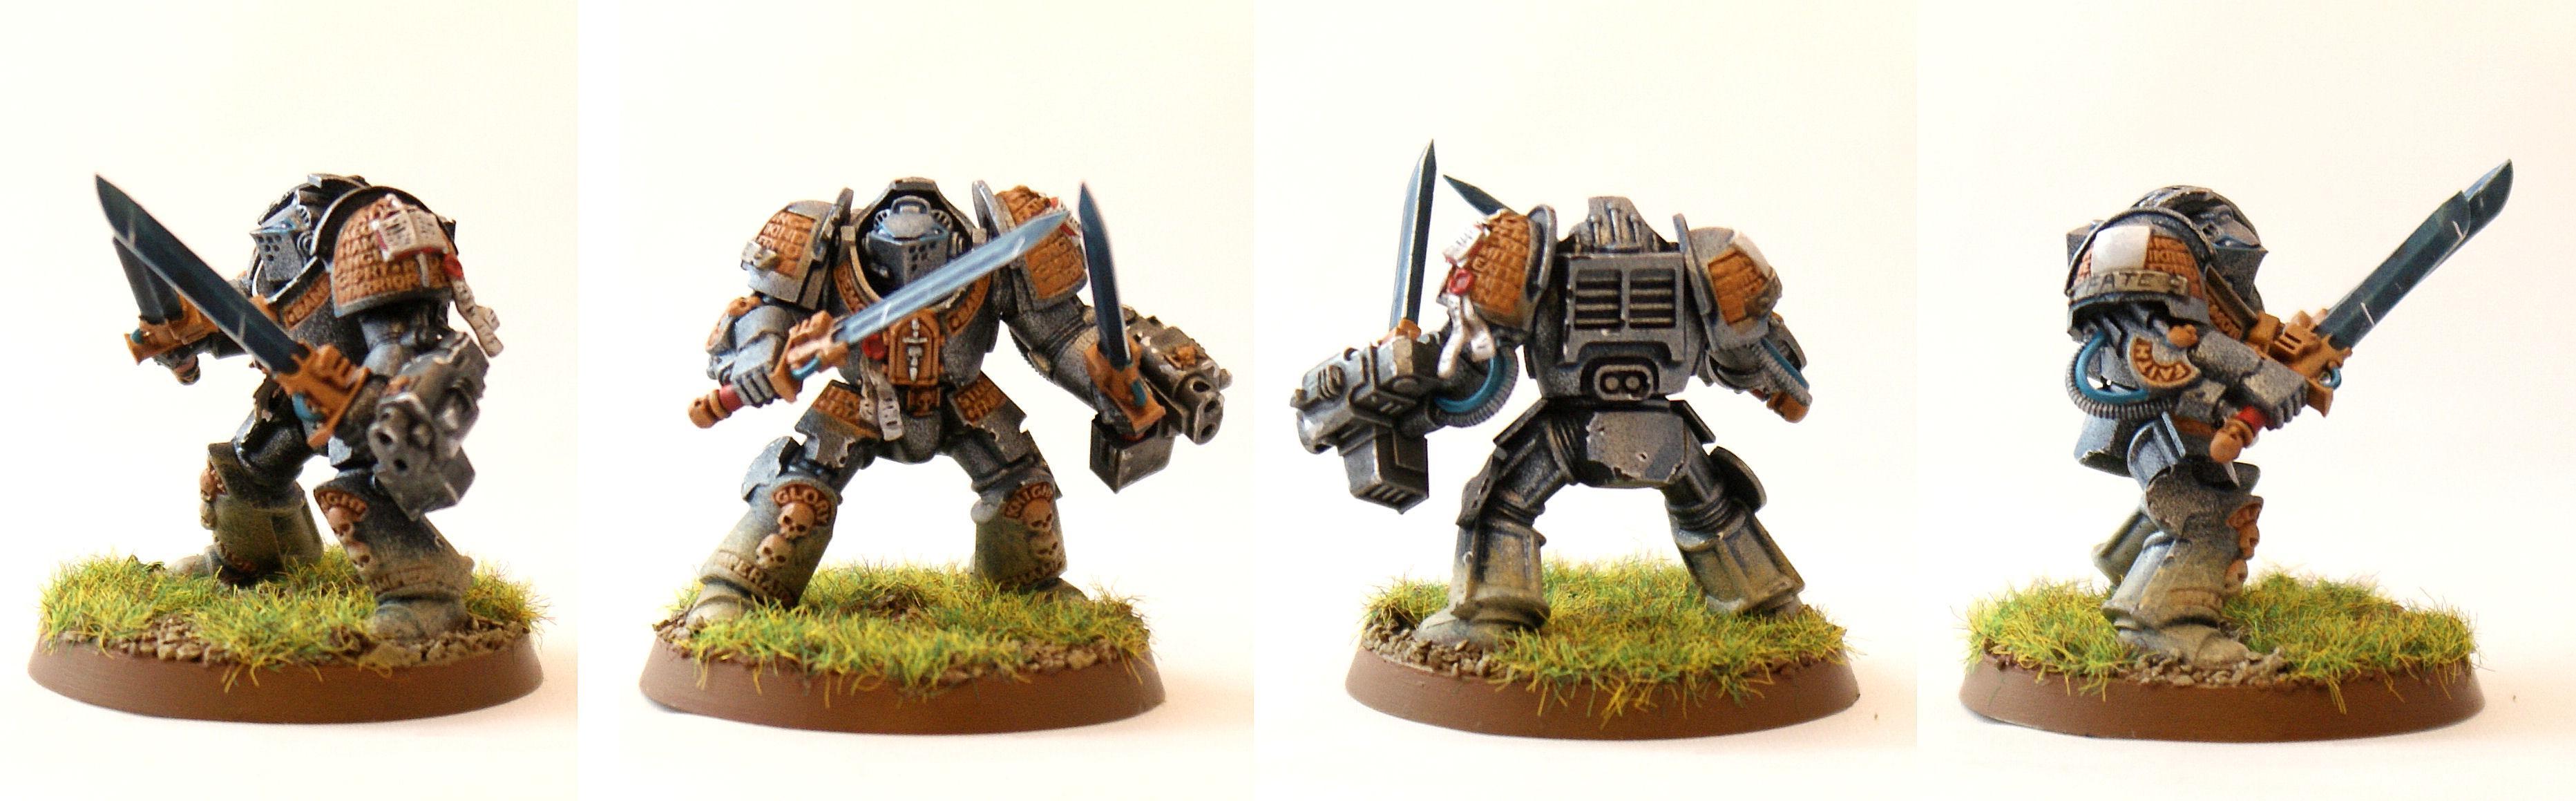 Falchions, Grey Knights, Terminator Armor